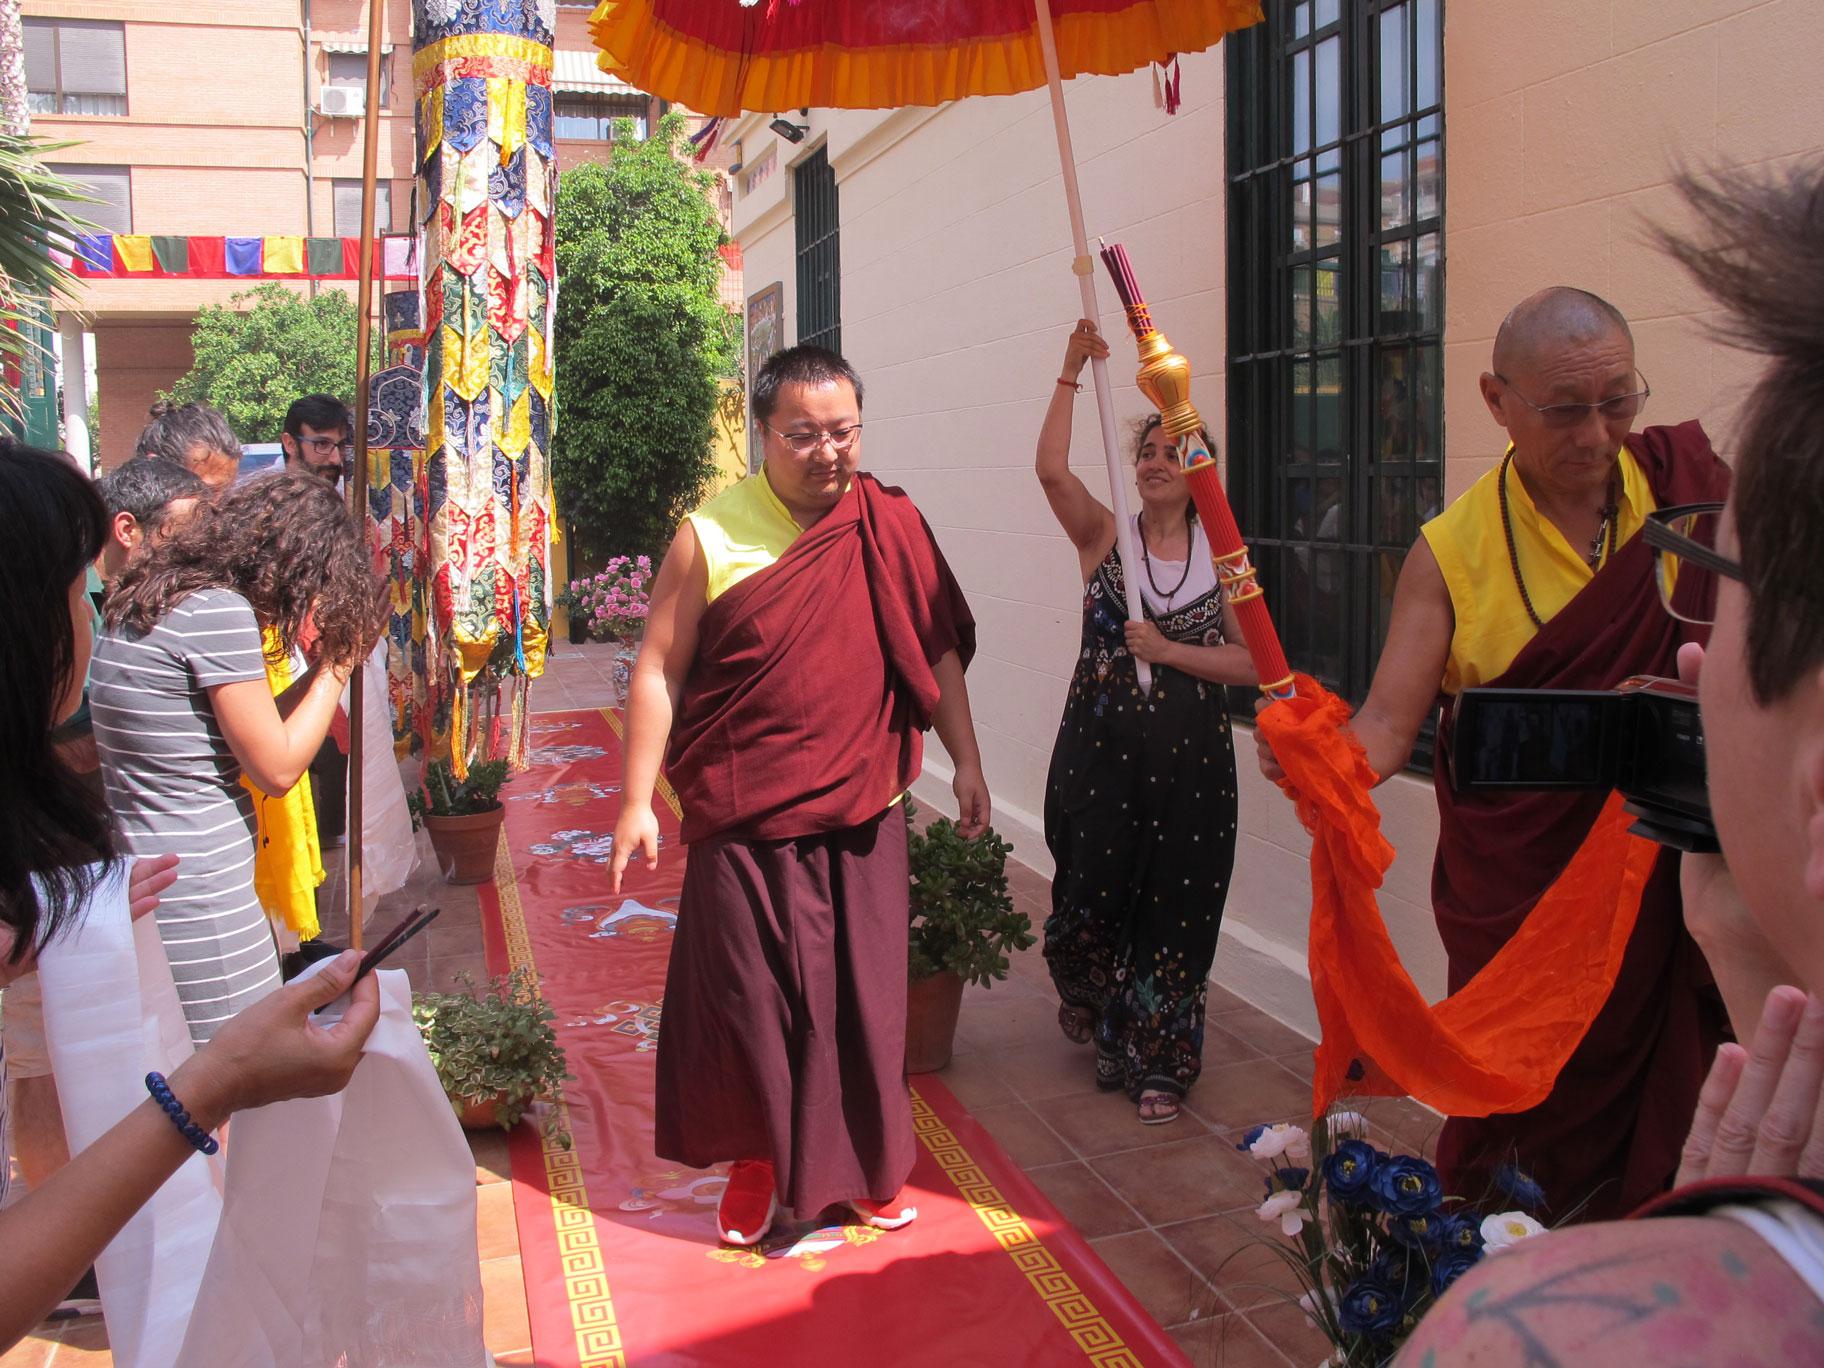 SS-Dudjom-Rinpoche-Sangye-Pema-Zhepa-evento-valencia-julio-2019-11